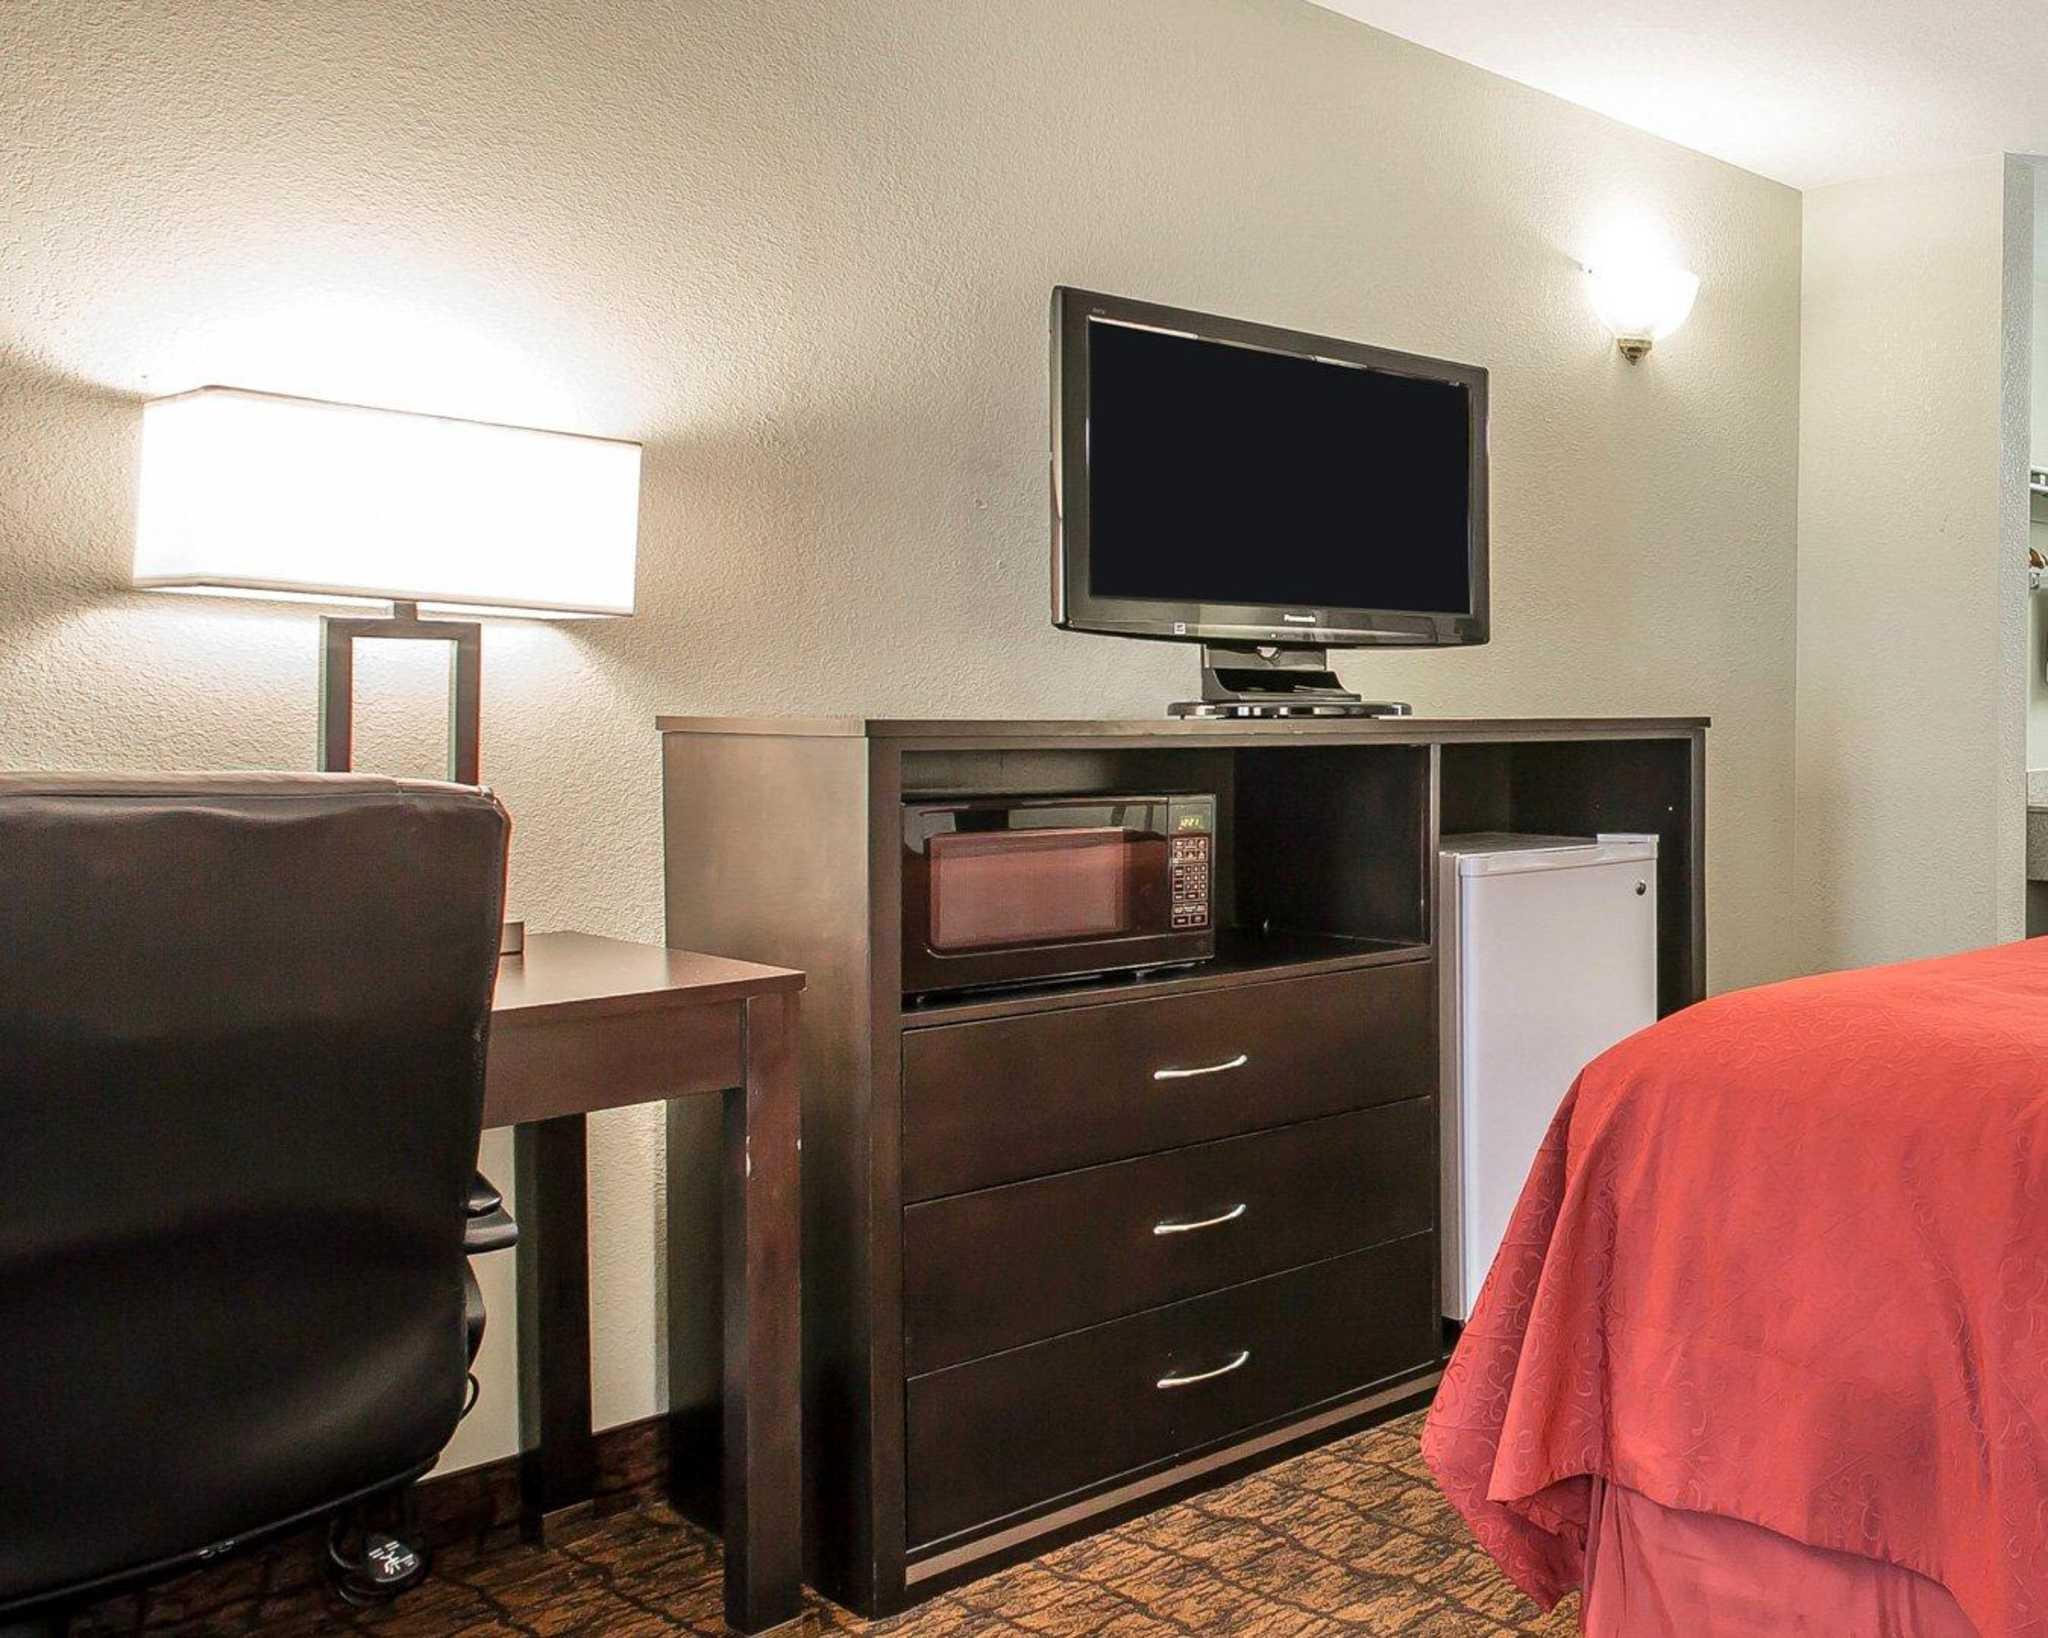 Quality Inn & Suites Woodland - Sacramento Airport image 5